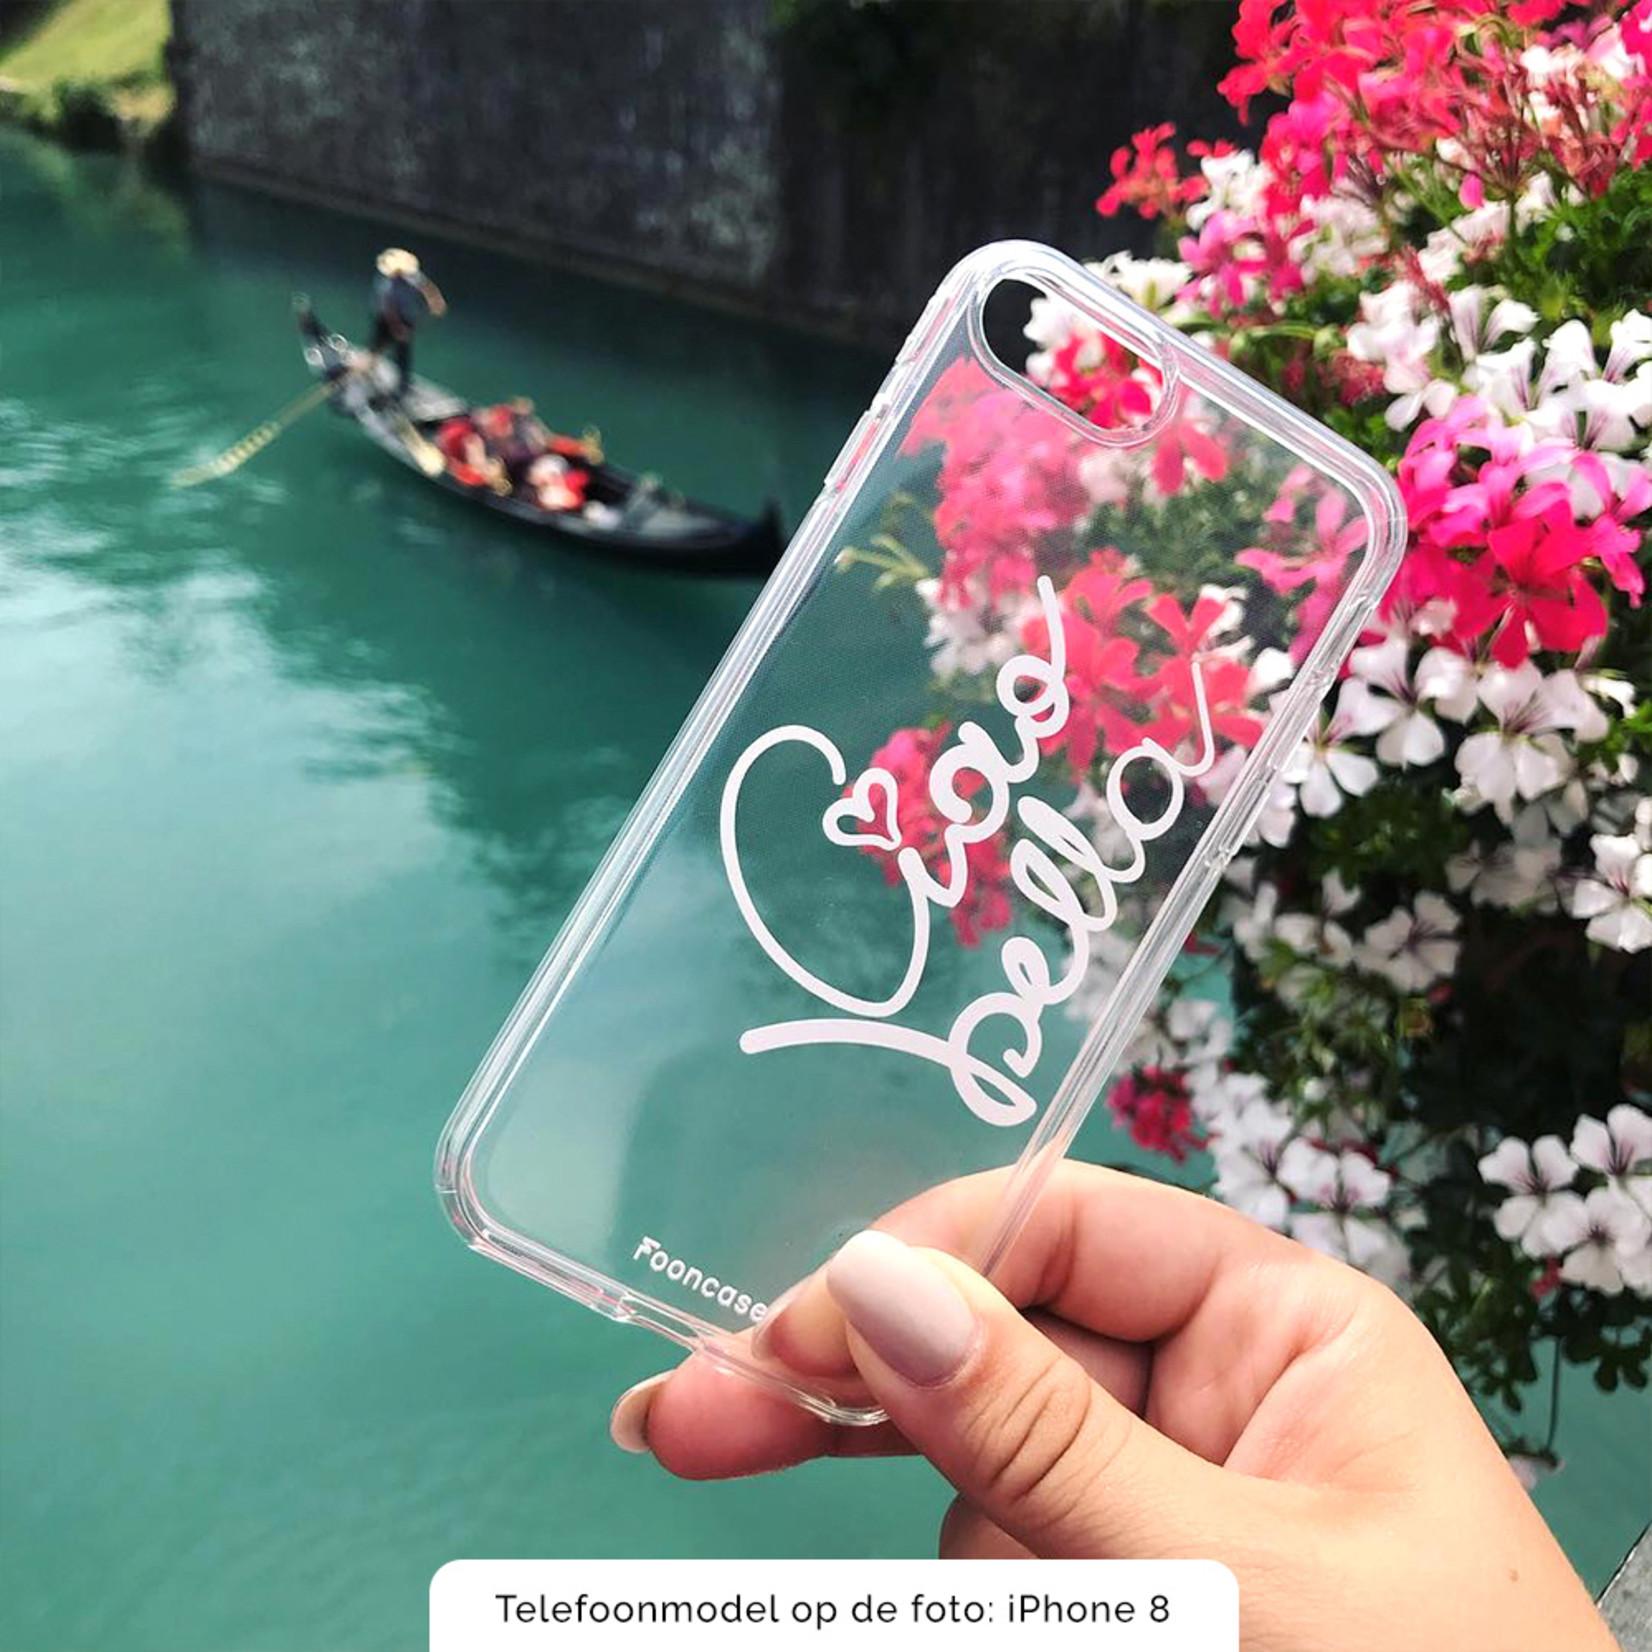 FOONCASE Iphone 8 Plus Handyhülle - Ciao Bella!